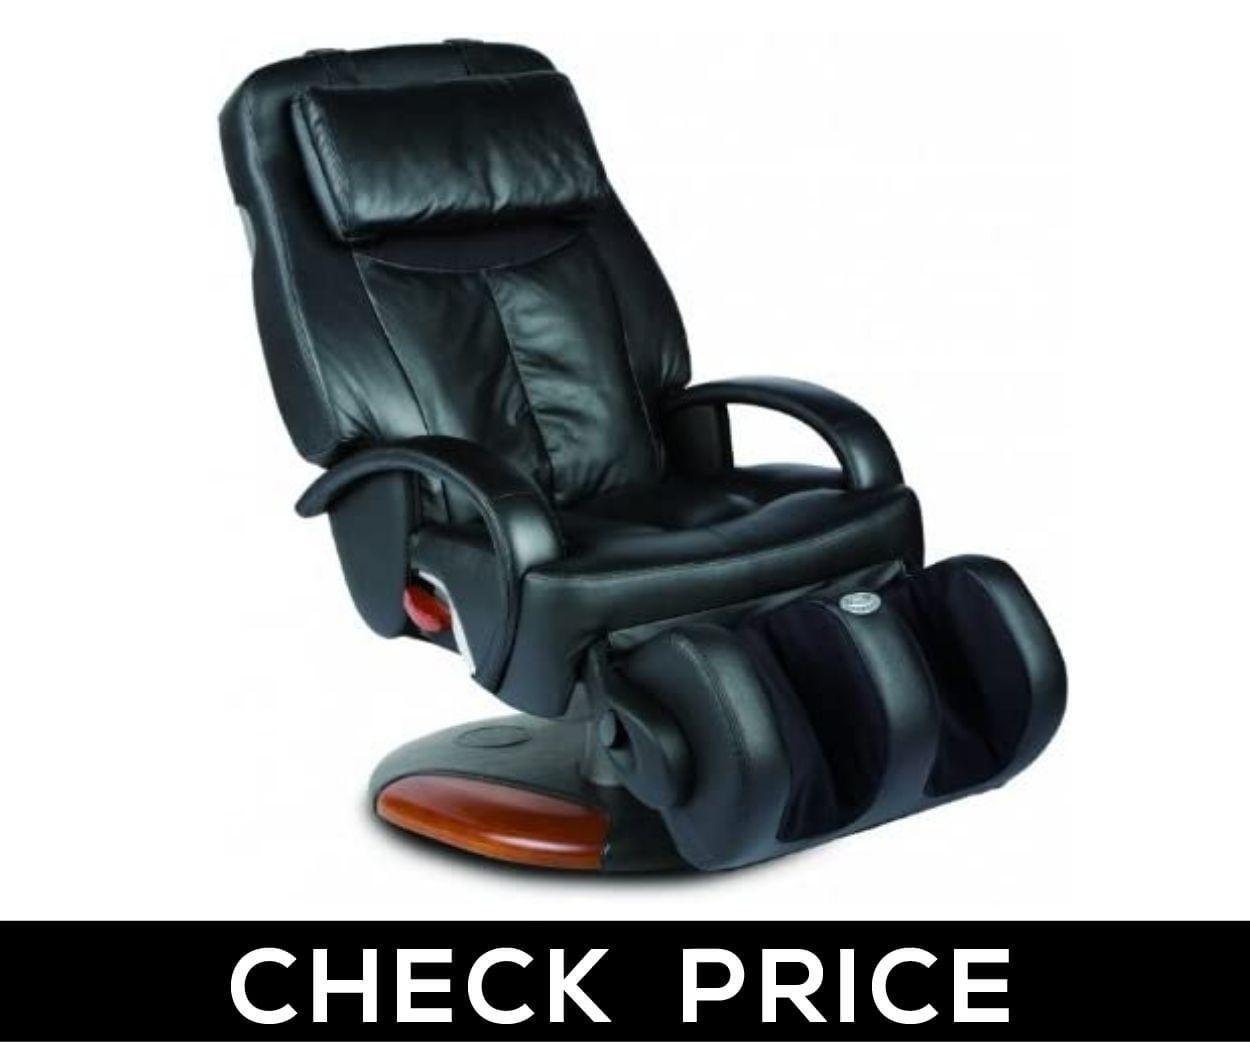 Human Touch 275 - Best Swivel Massage Chair